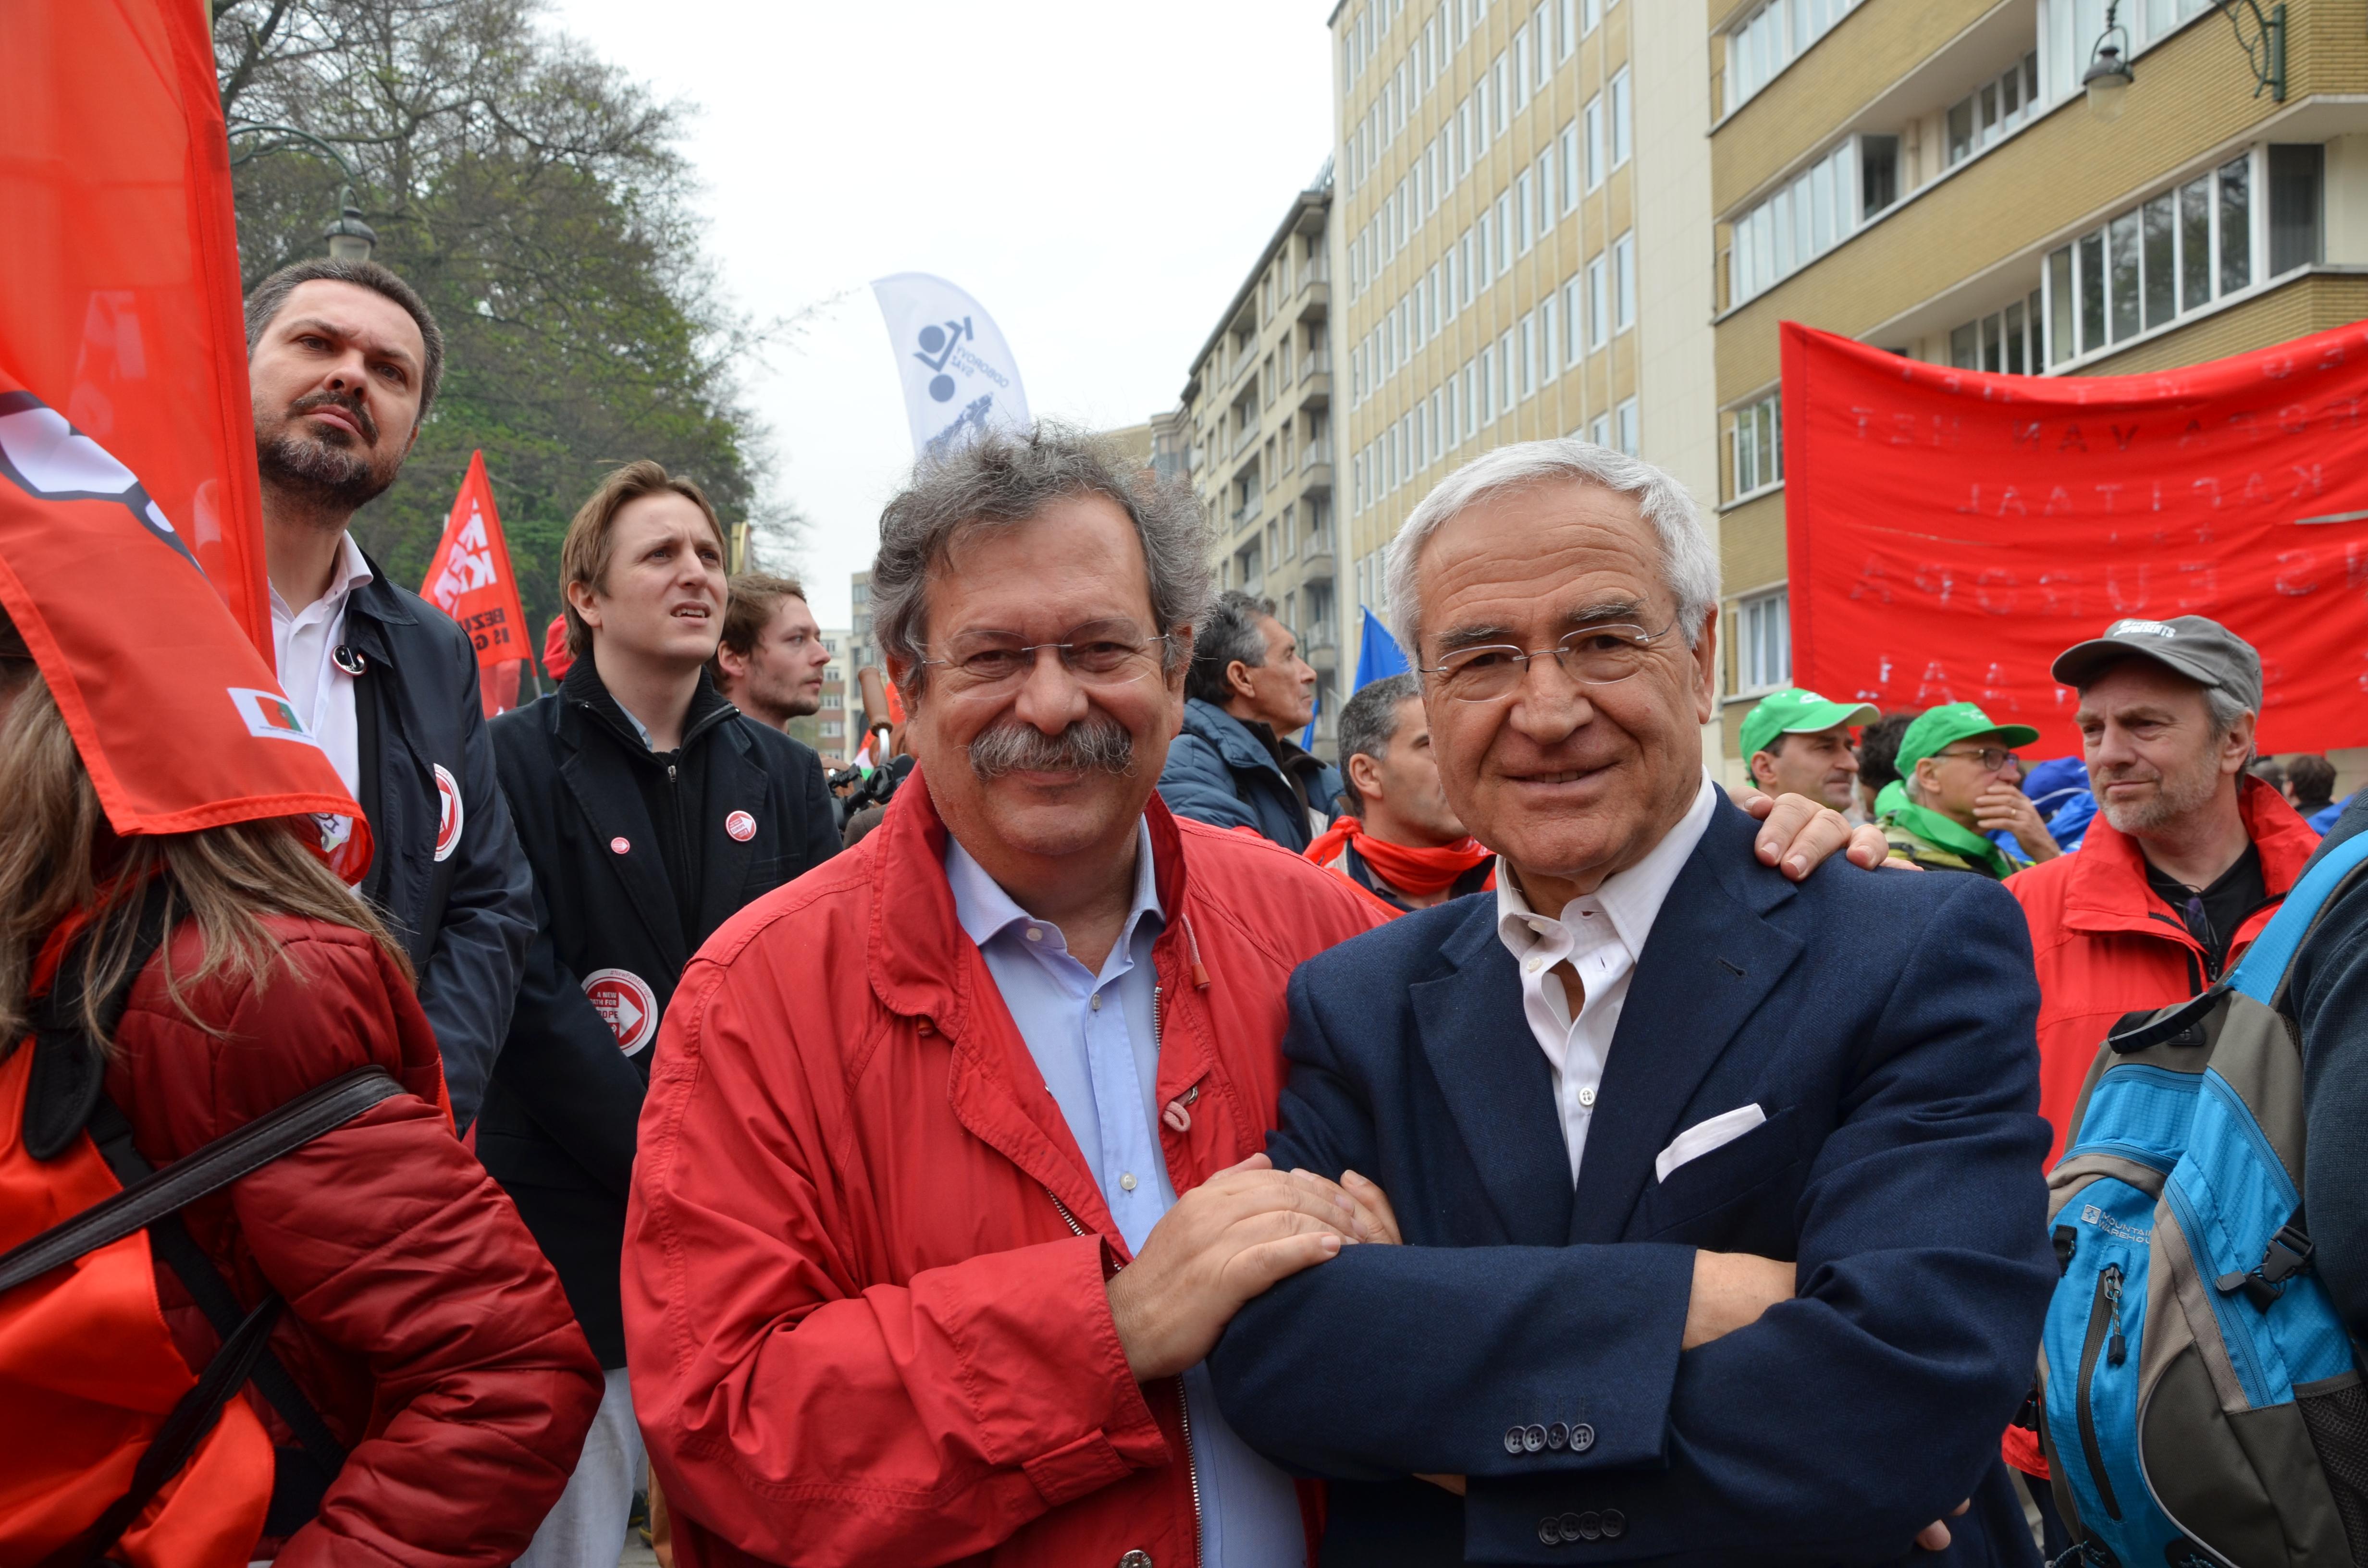 Carmelo Cedrone and Edgardo Iozia